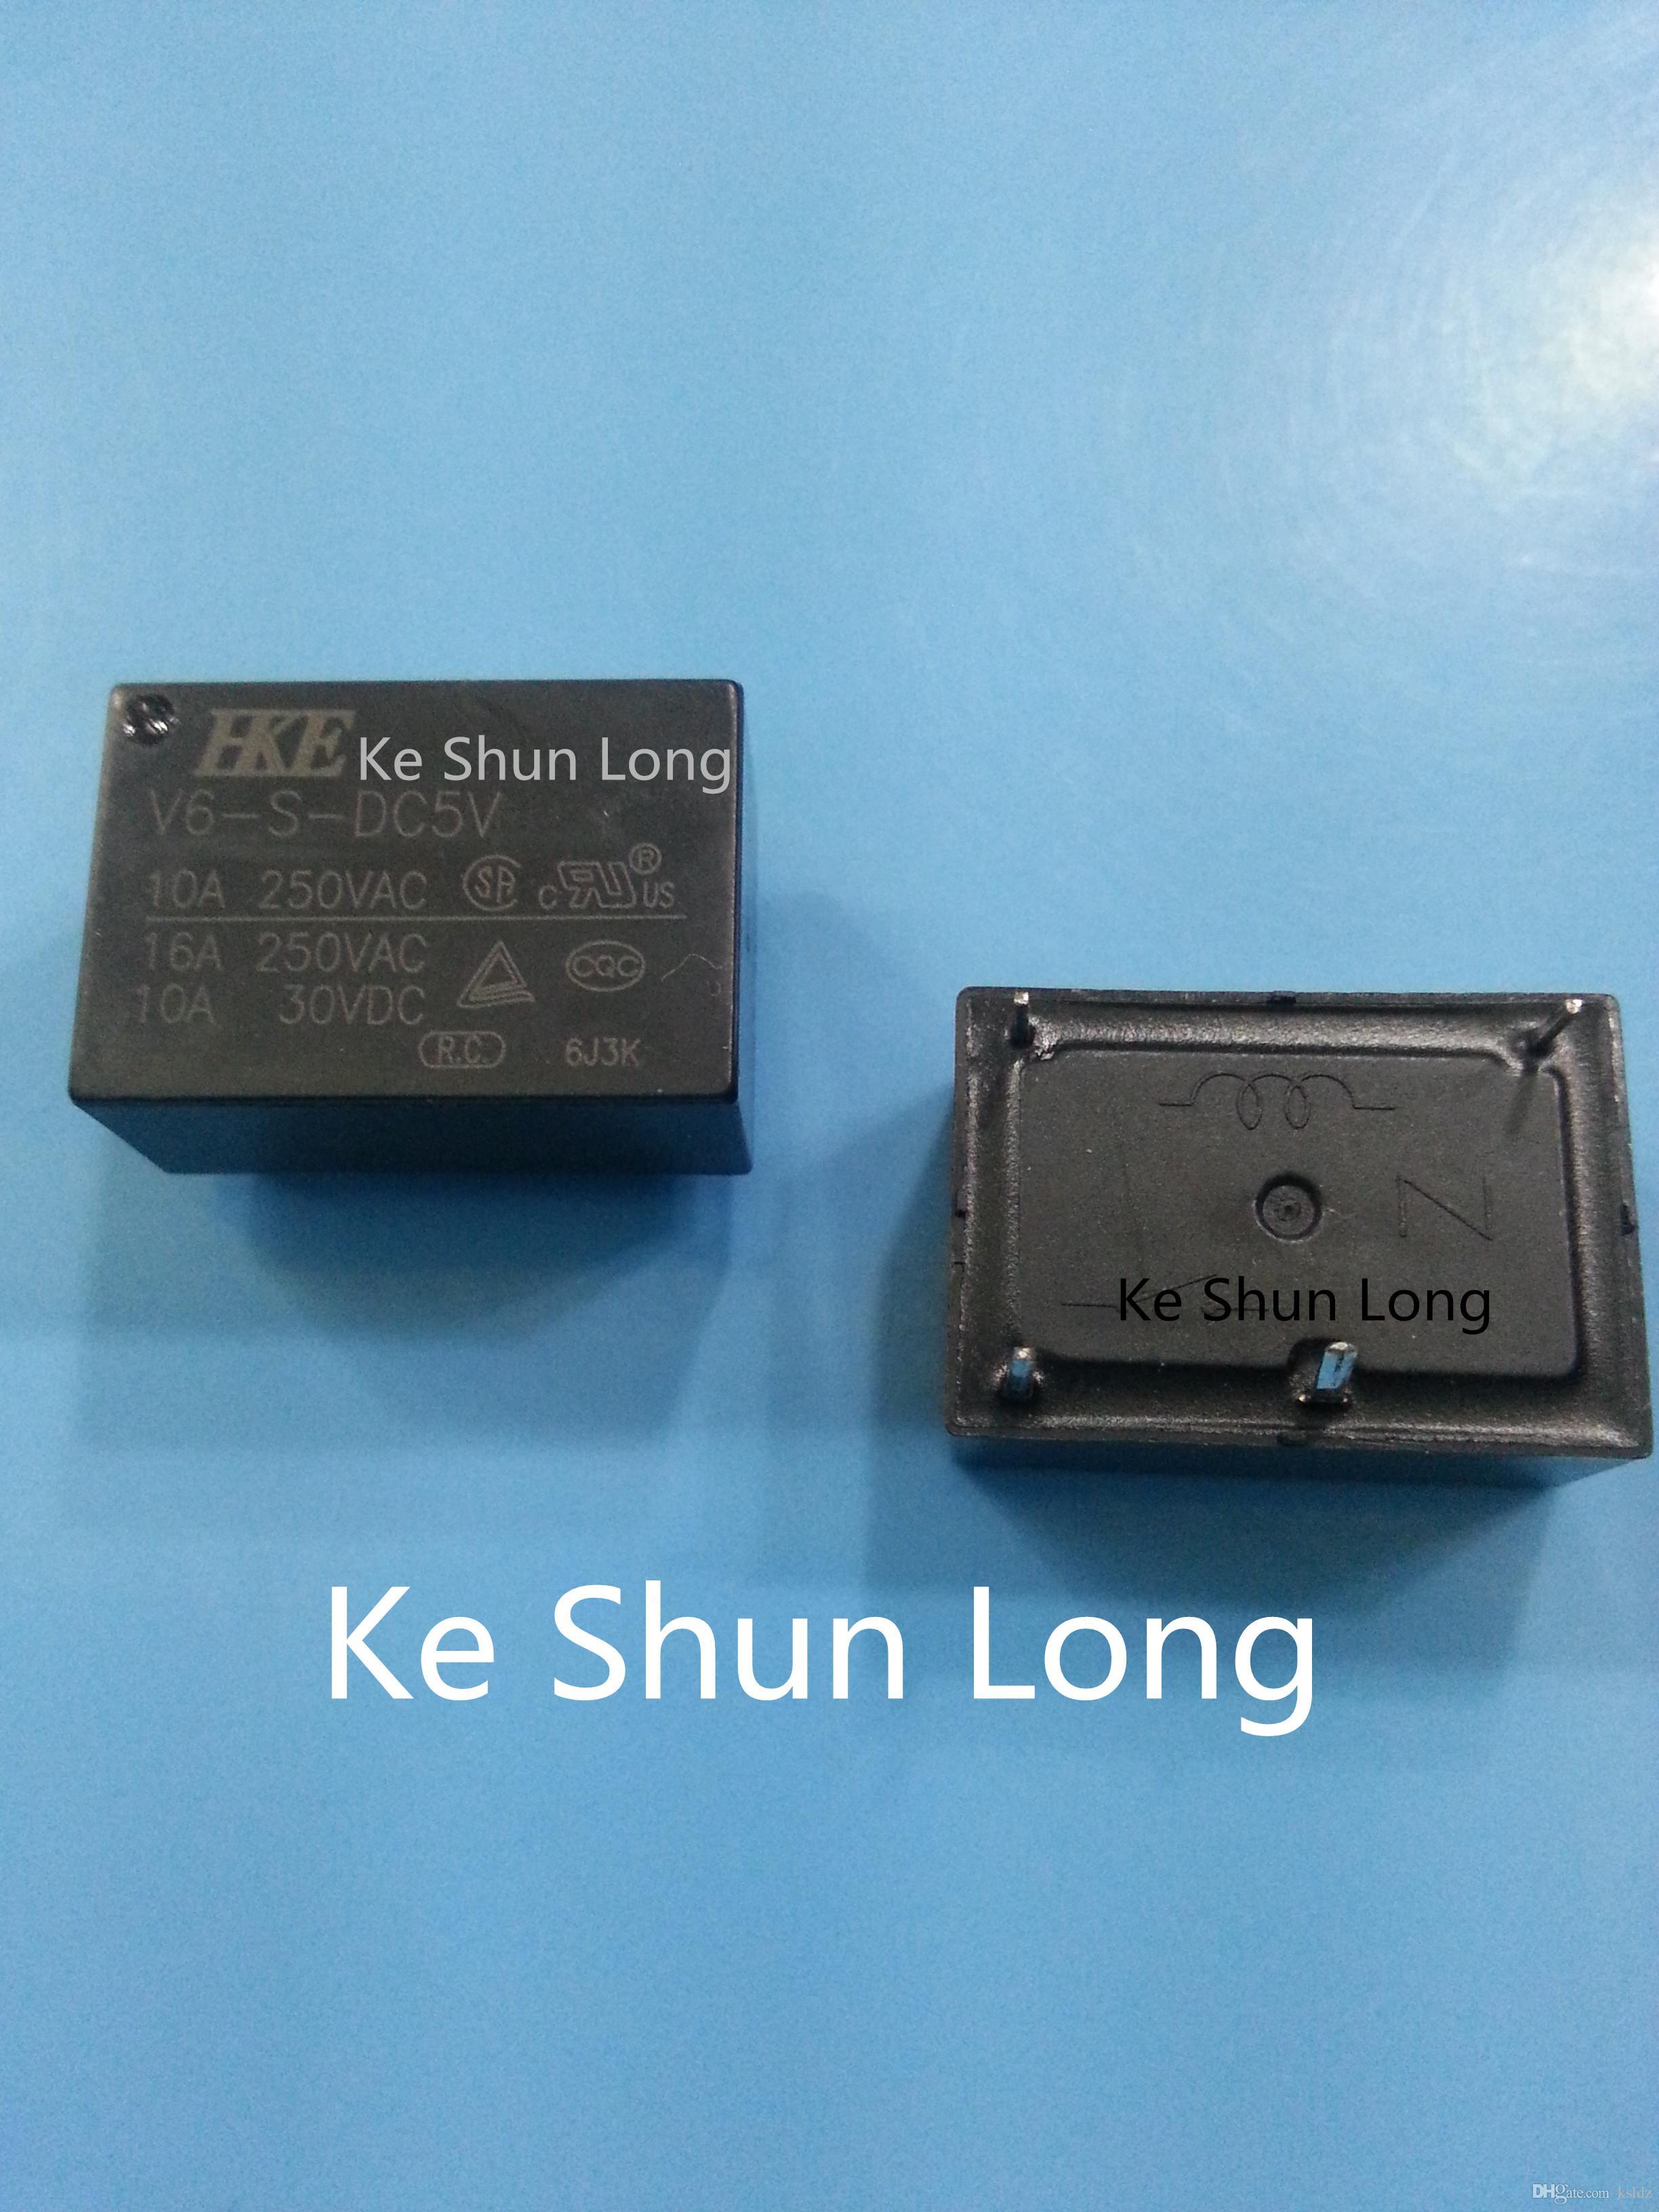 Freies Verschiffen Los (5pieces / lot) 100% ursprüngliches neues HKE V6-S-DC5V V6-S-5VDC V6-S-DC12V V6-S-12VDC V6-S-DC24V V6-S-24VDC 4PINS Leistungsrelais 10A